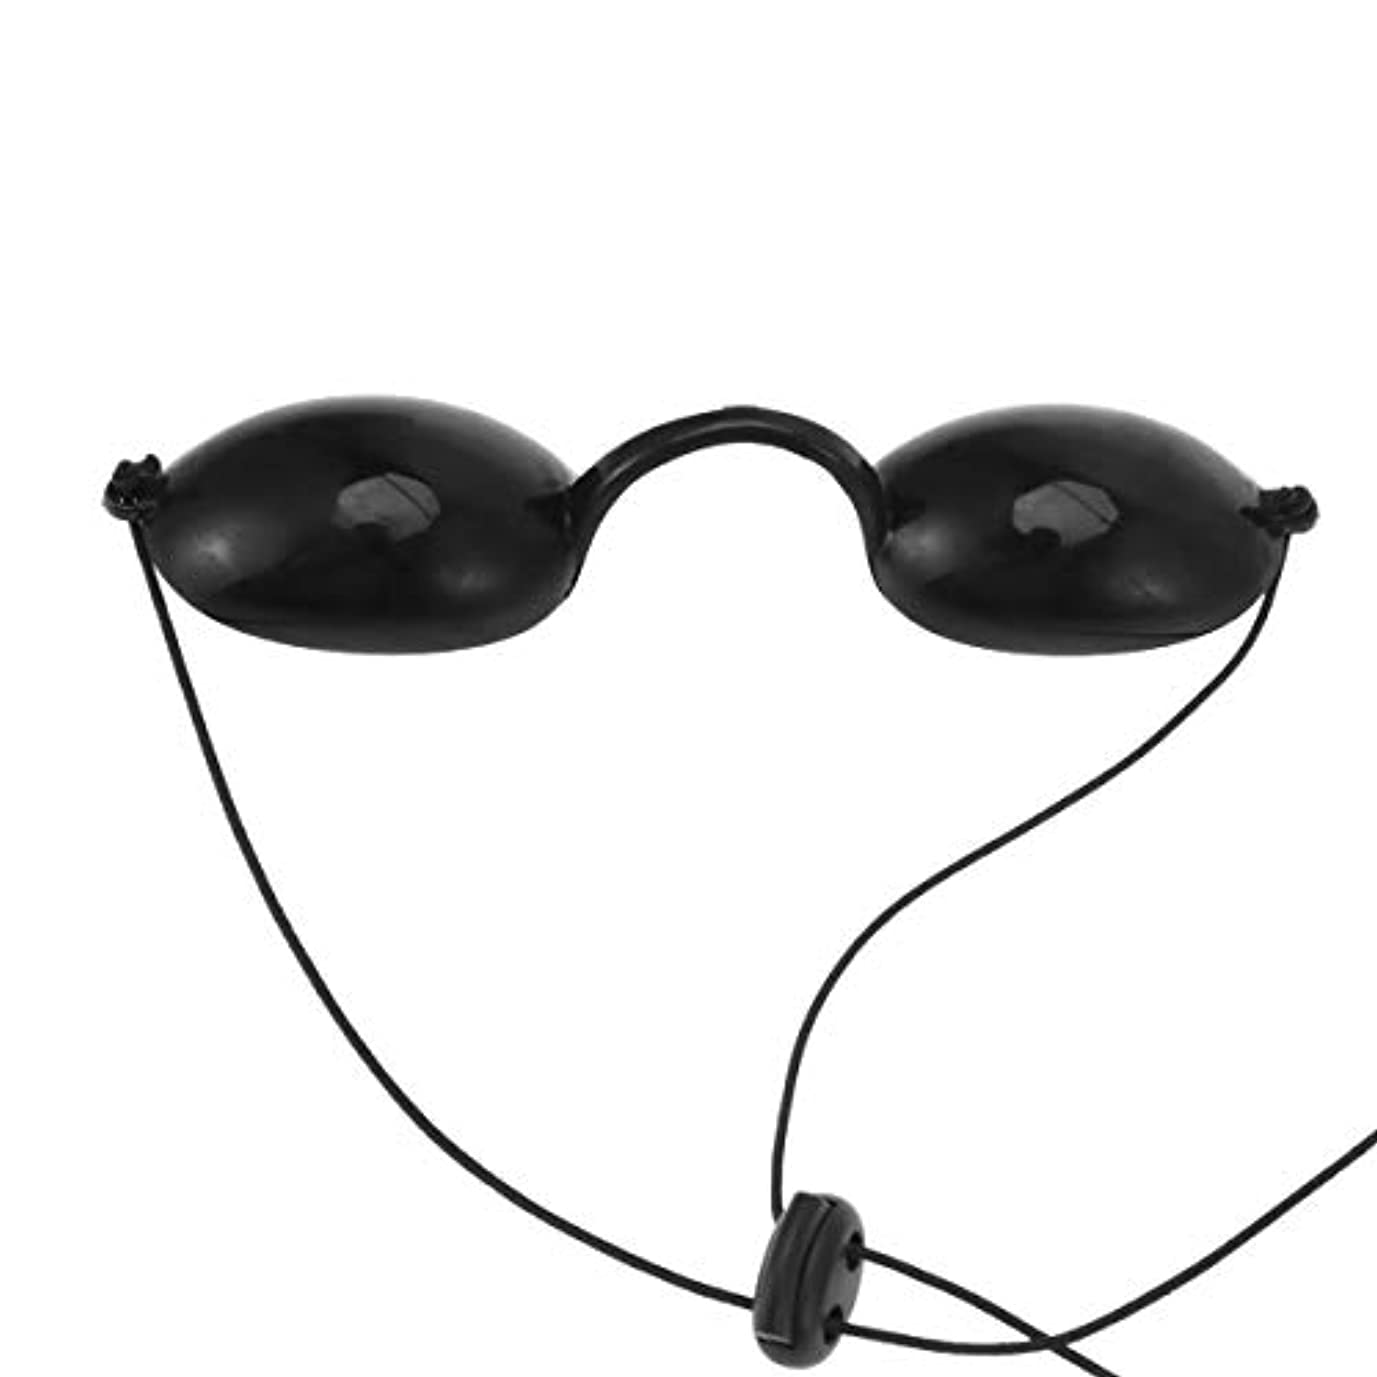 Healifty 眼用保護具日焼け止めゴーグル不透明保護メガネアイシールドスペシャル(目黒)